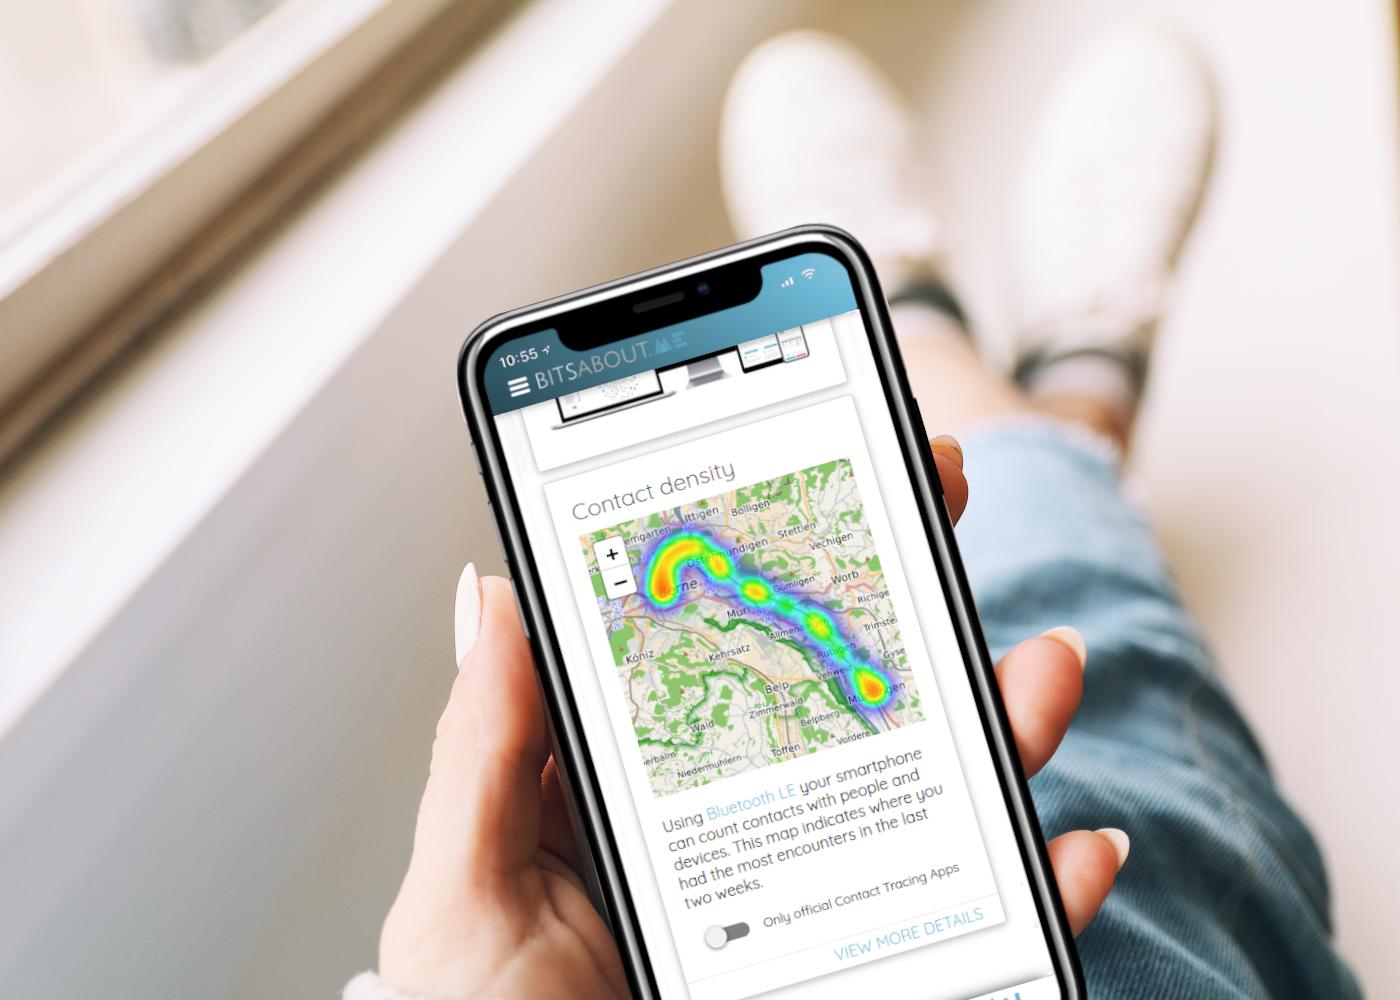 Kontaktdichte auf BitsaboutMe Mobile App